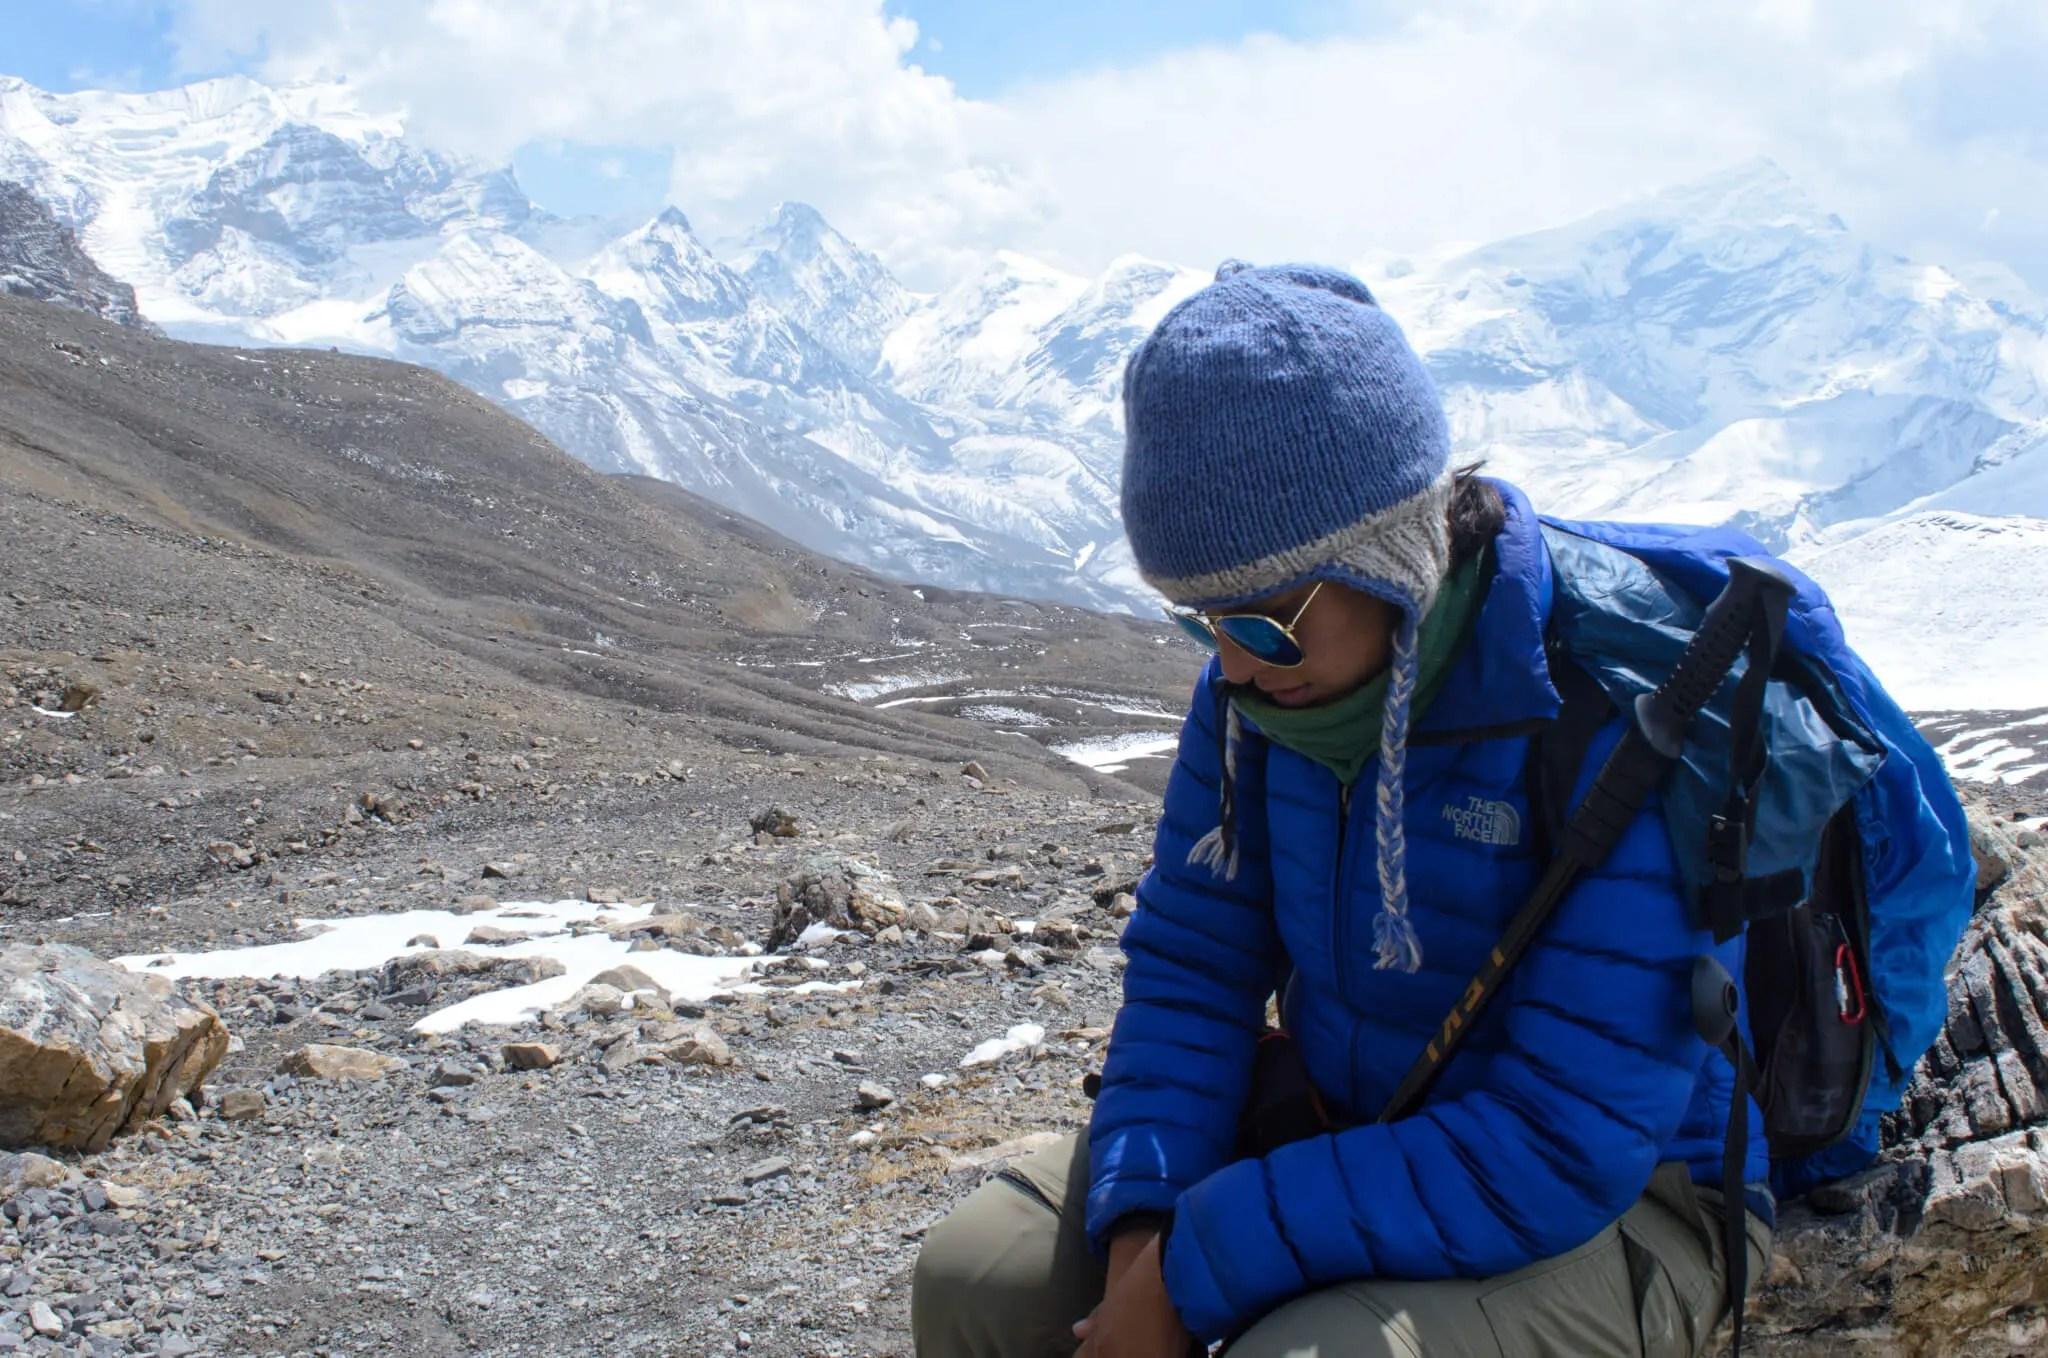 Celeste descansando en el Circuito de Annapurna